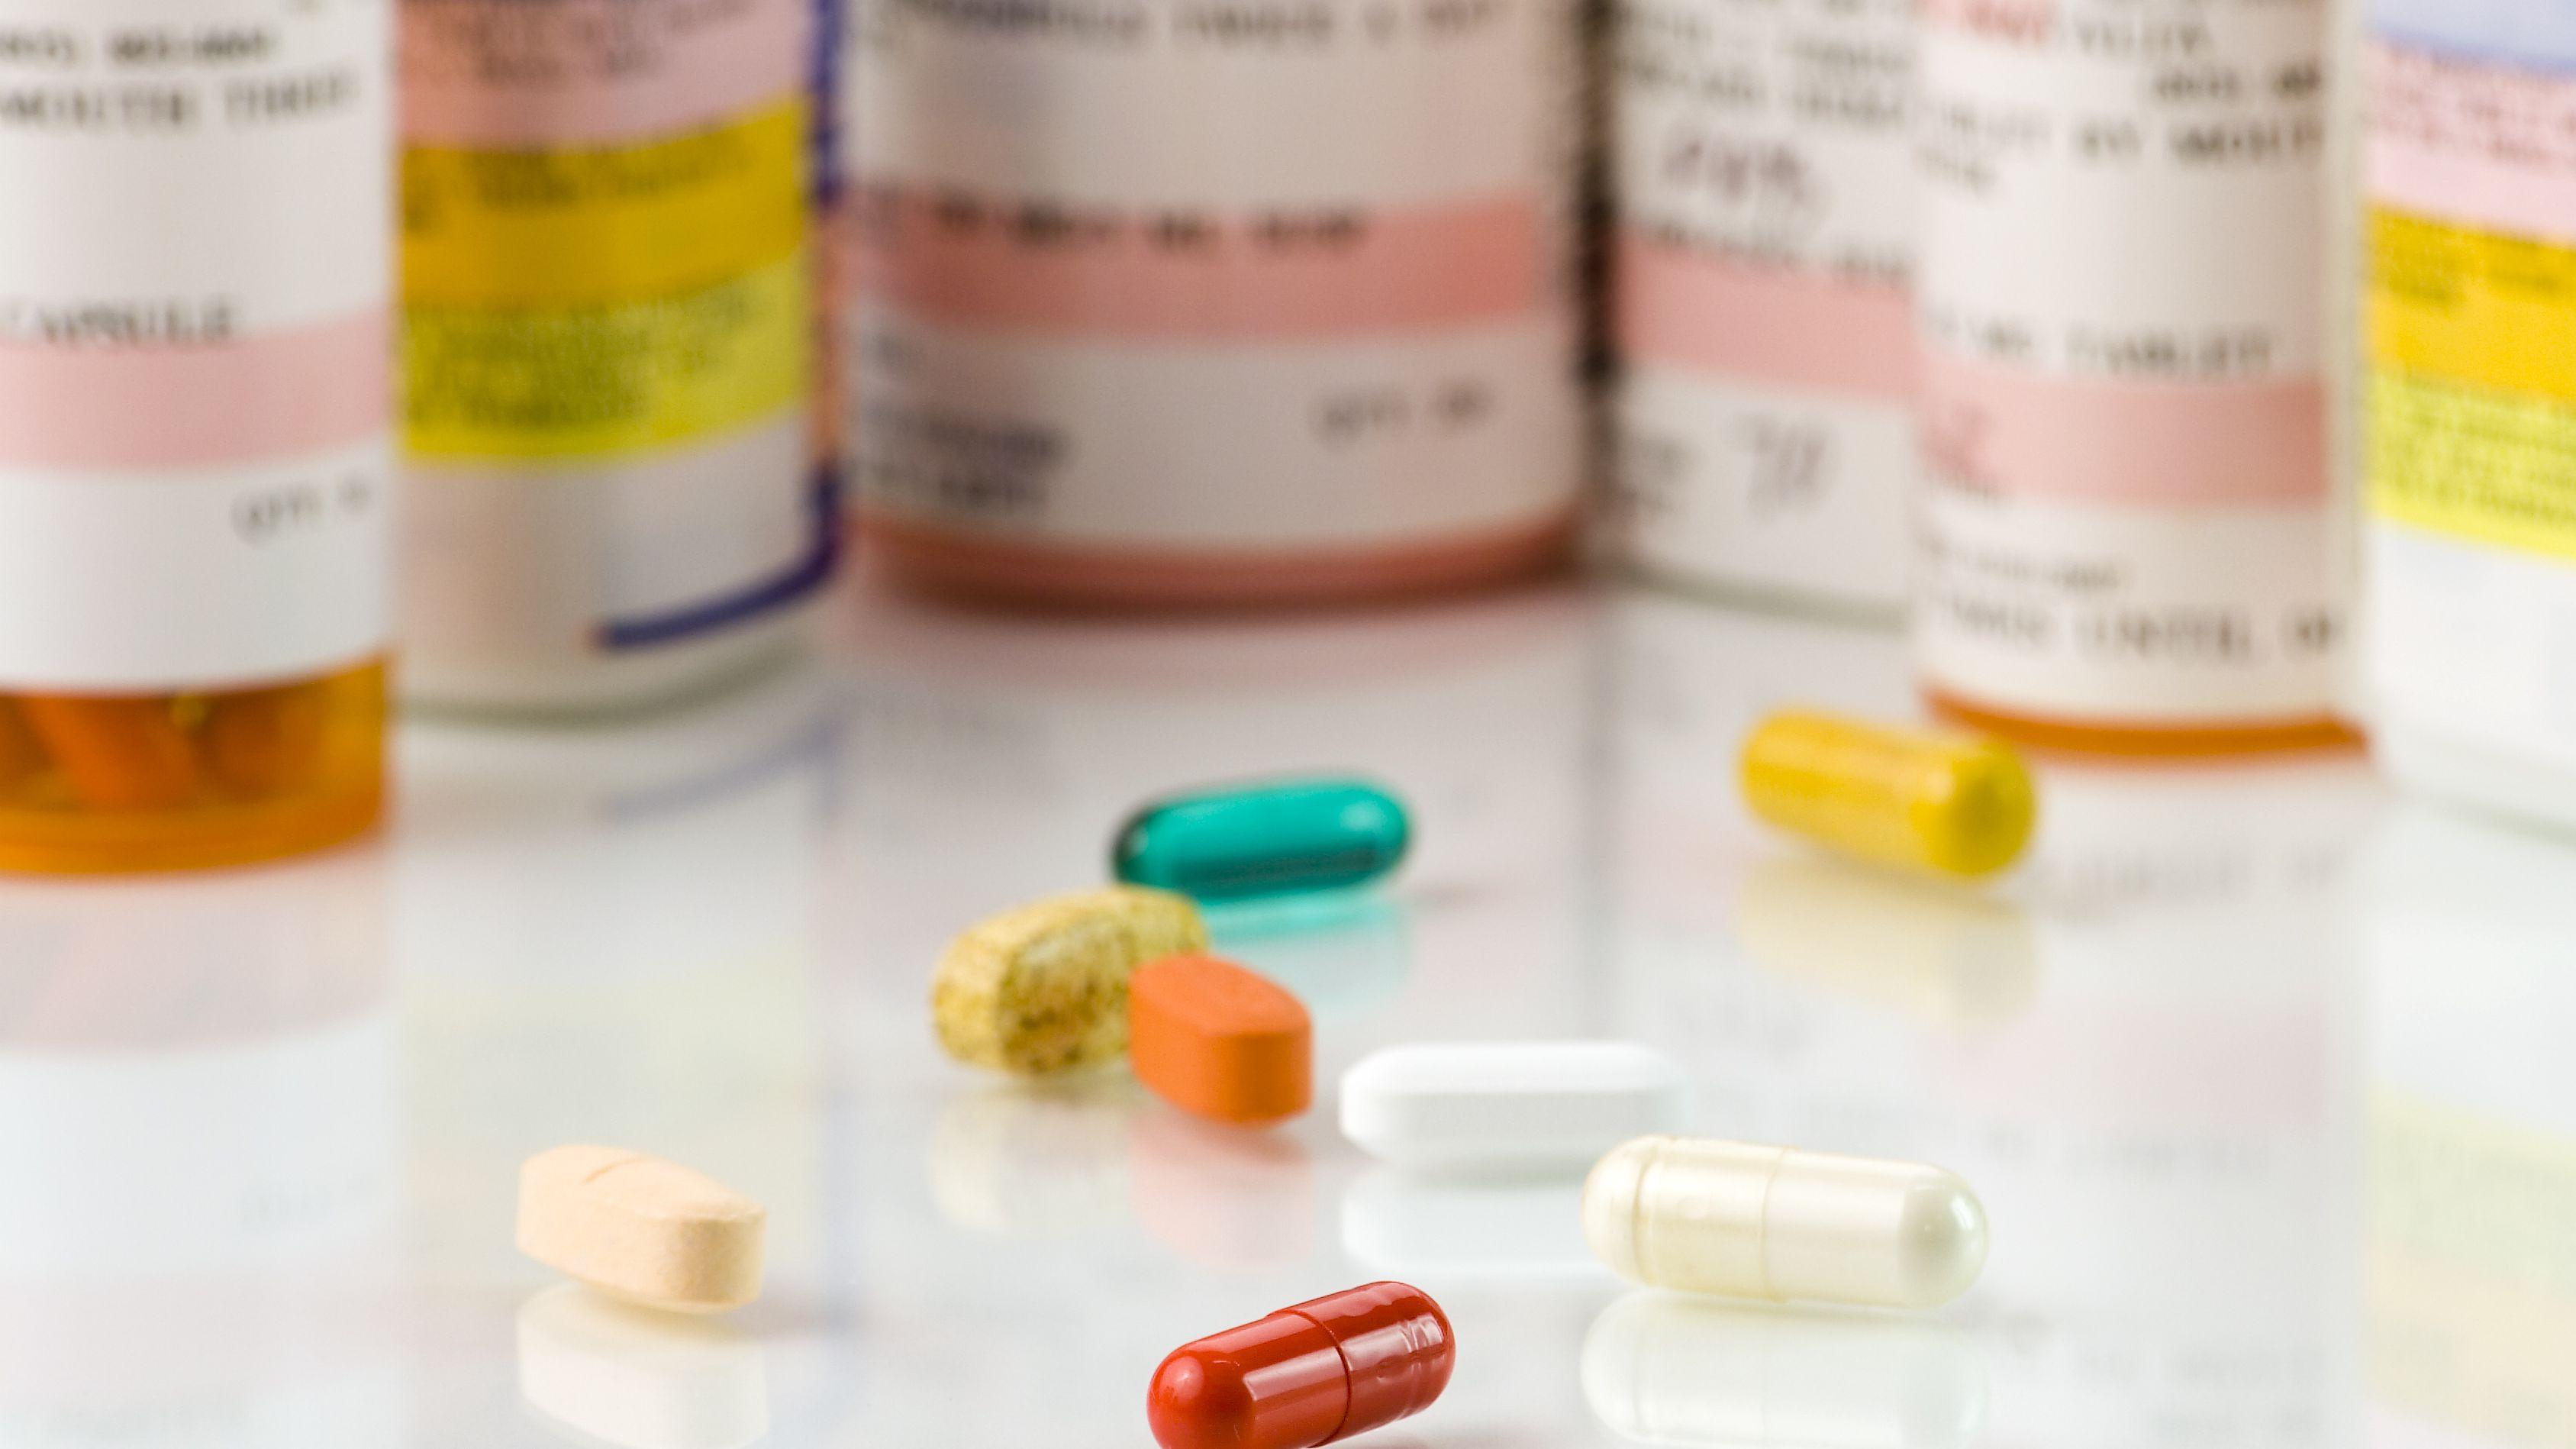 Tamoxifen Drug Interactions